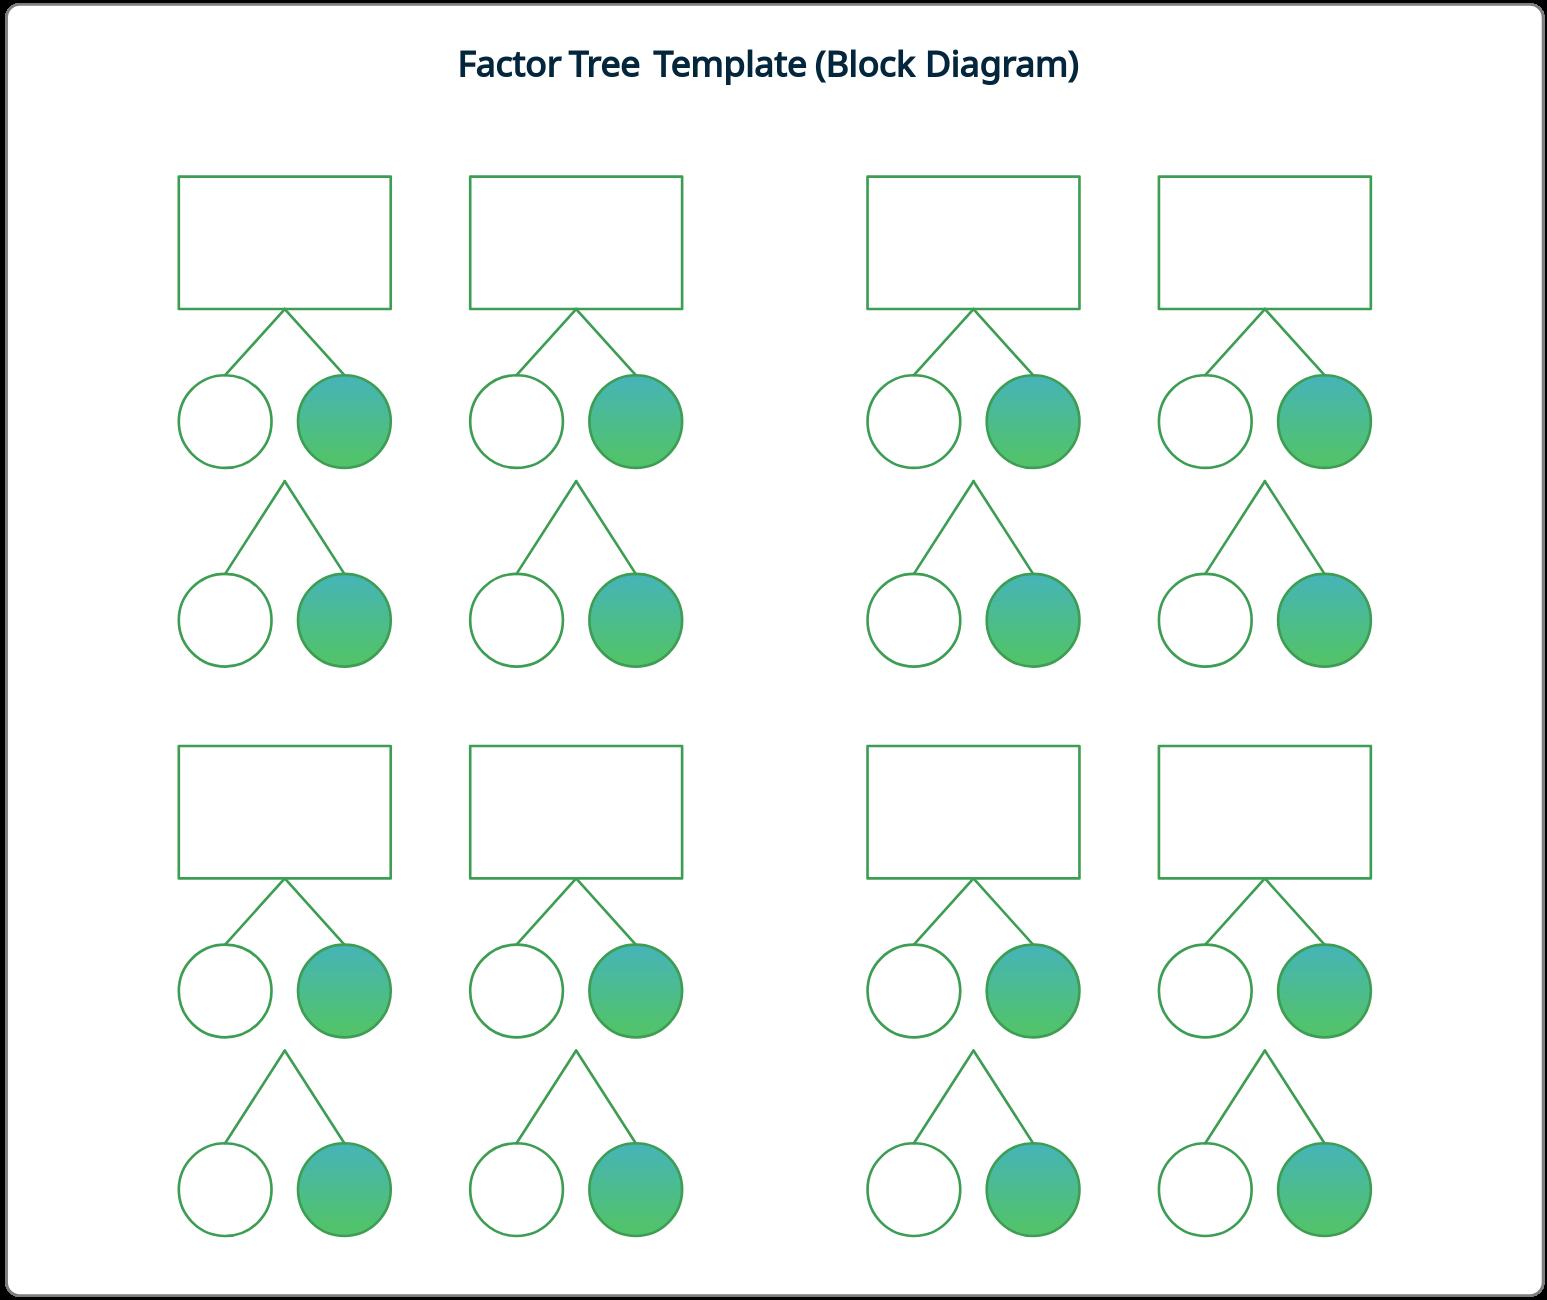 Factor Tree Template (Block Diagram)